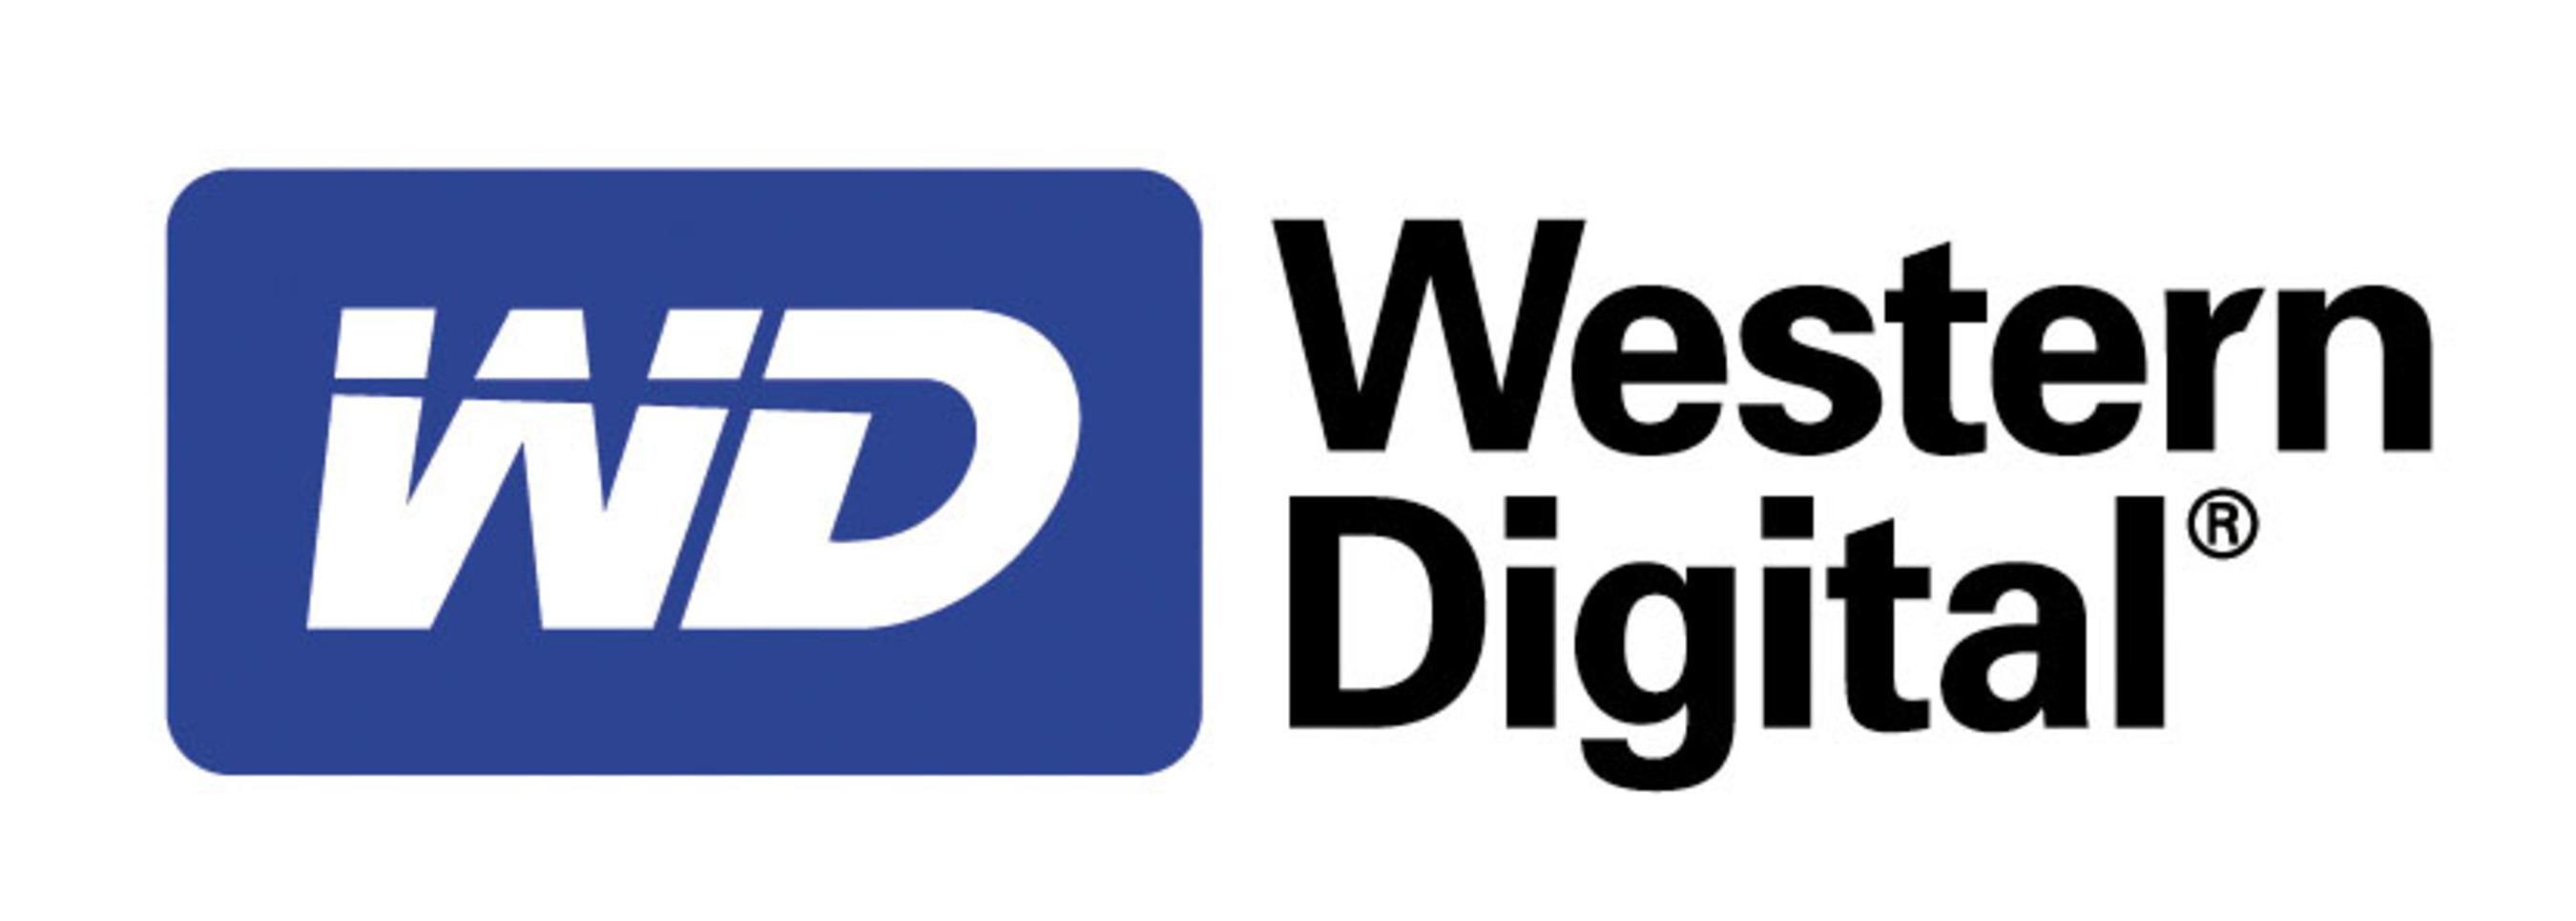 Western Digital Technographics